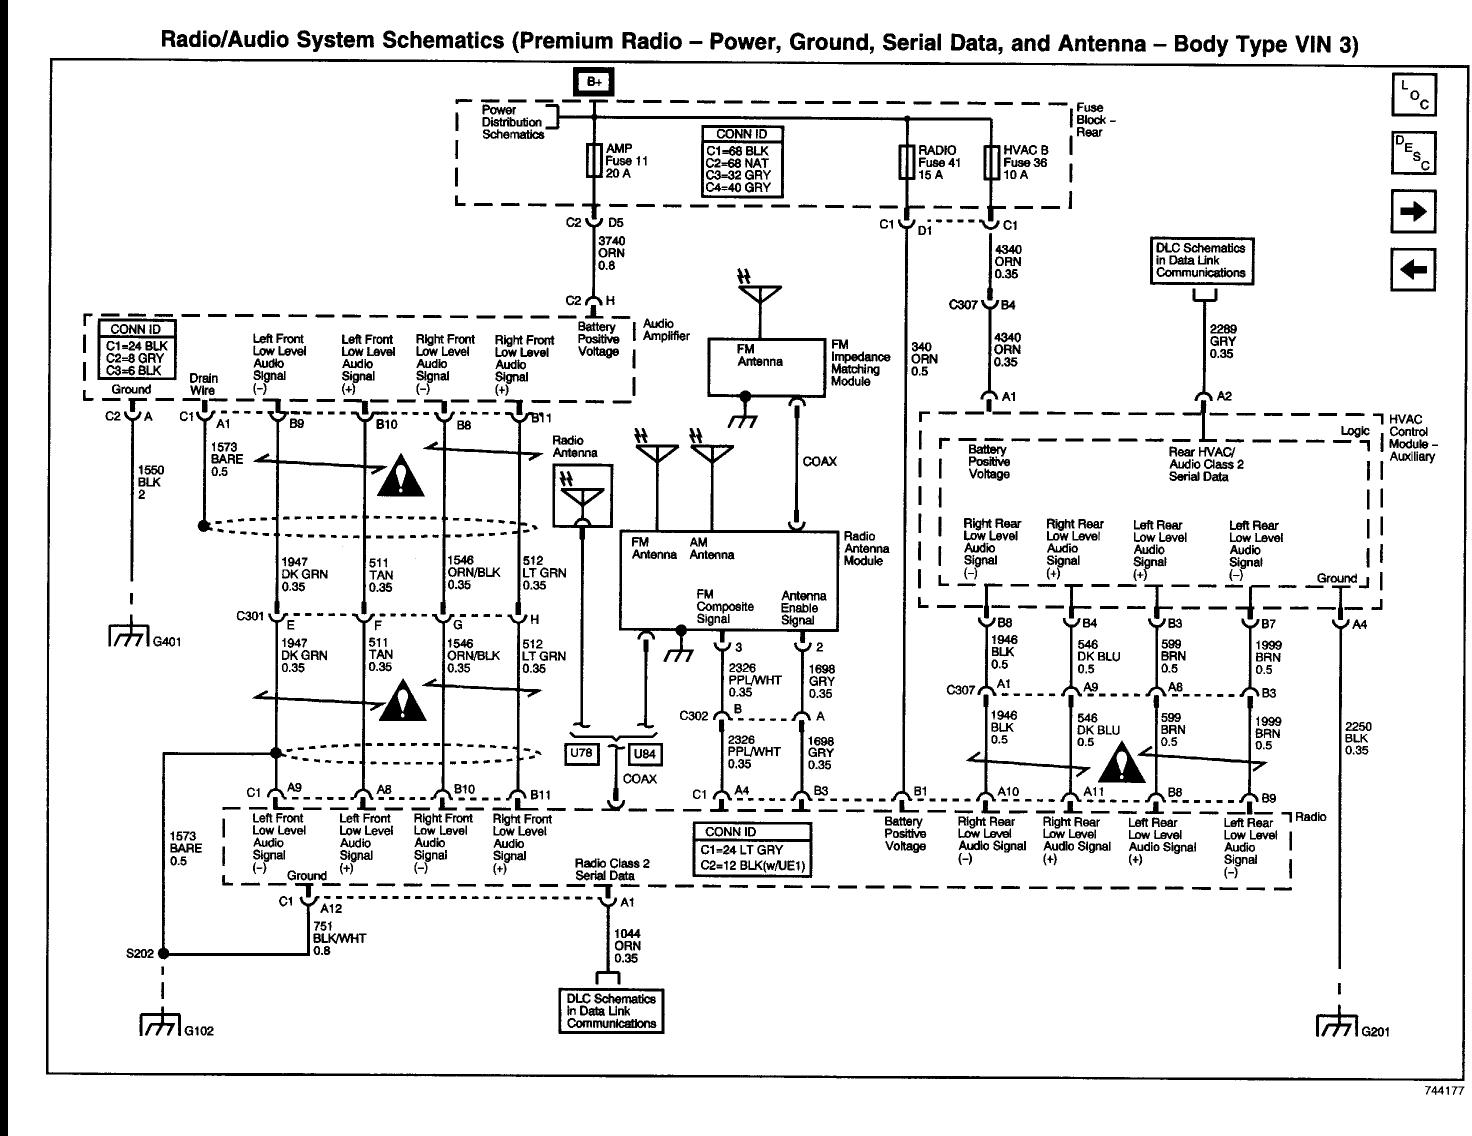 2000 gmc sierra stereo wiring diagram free wiring diagram 2004 gmc sierra 2500 wiring diagram 2004 gmc sierra 2500 wiring diagram 2004 gmc sierra 2500 wiring diagram 2004 gmc sierra 2500 wiring diagram